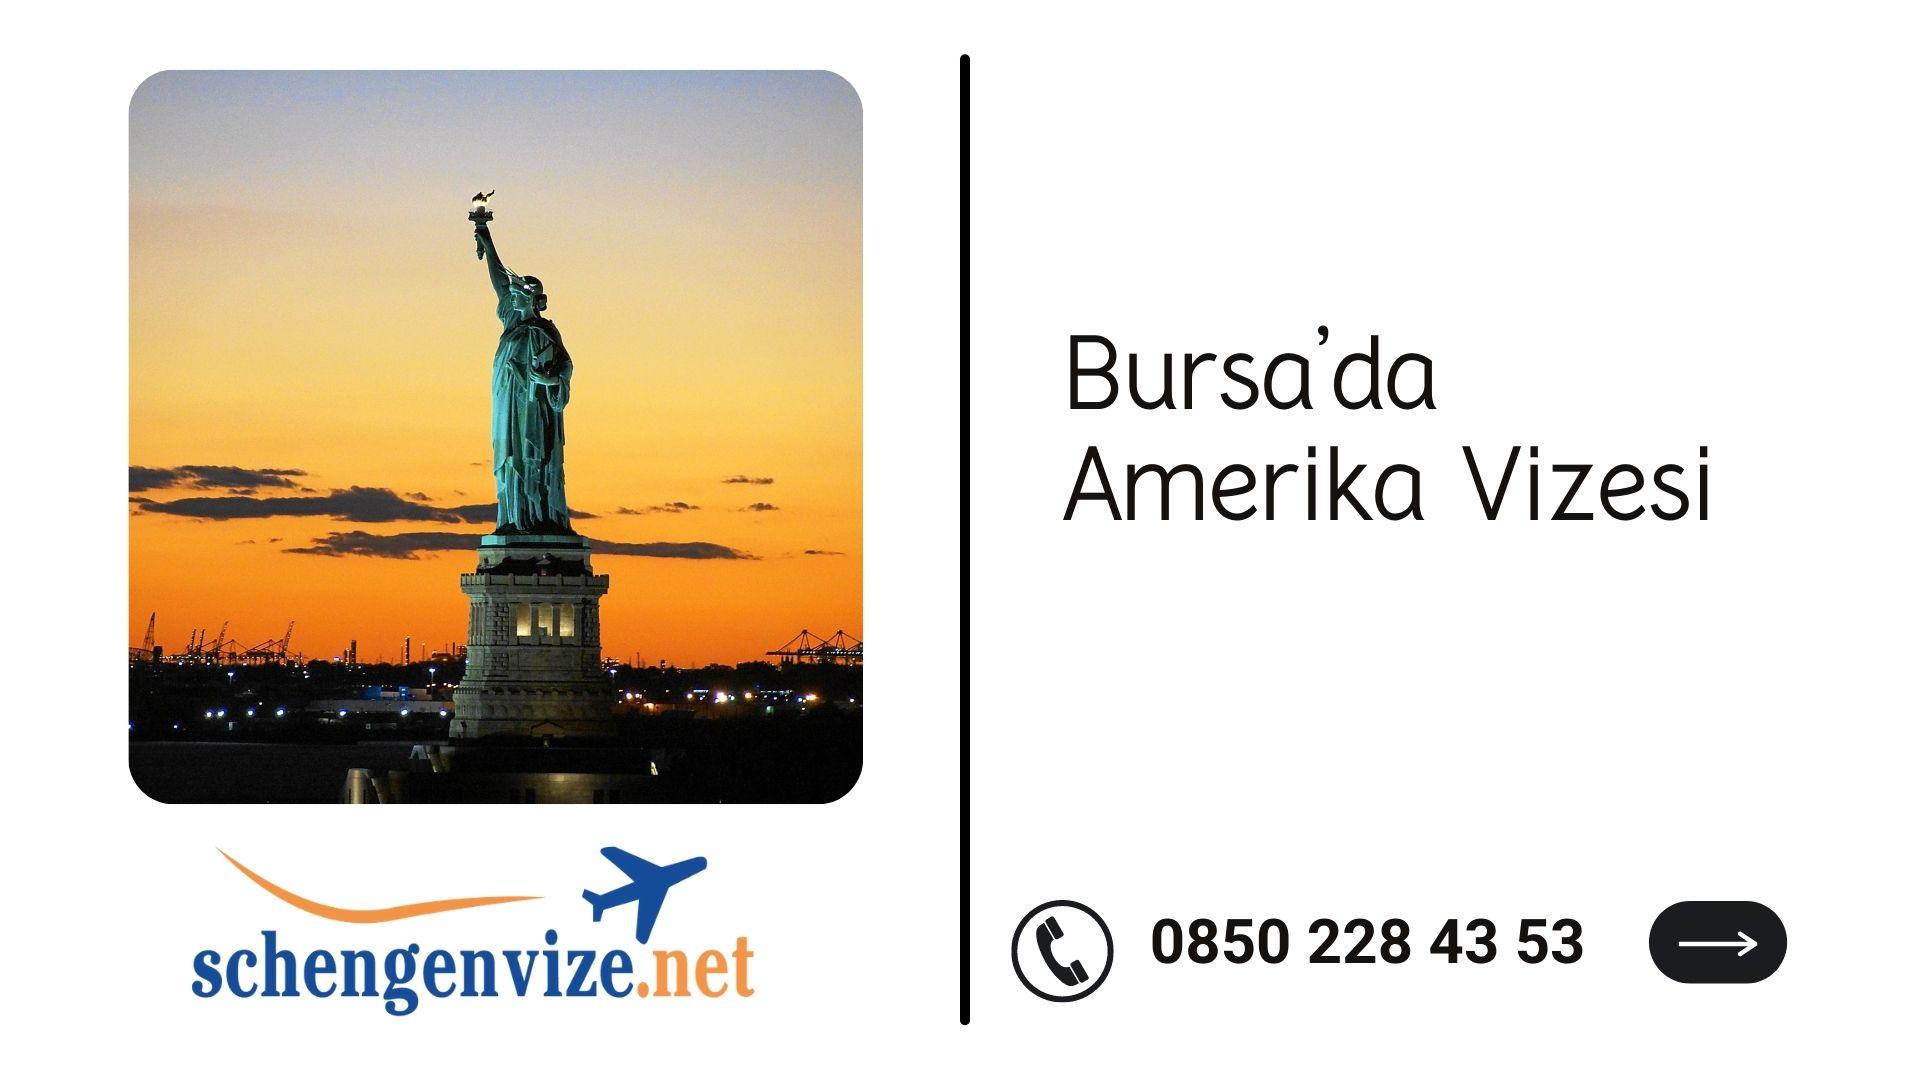 Bursa'da Amerika Vizesi